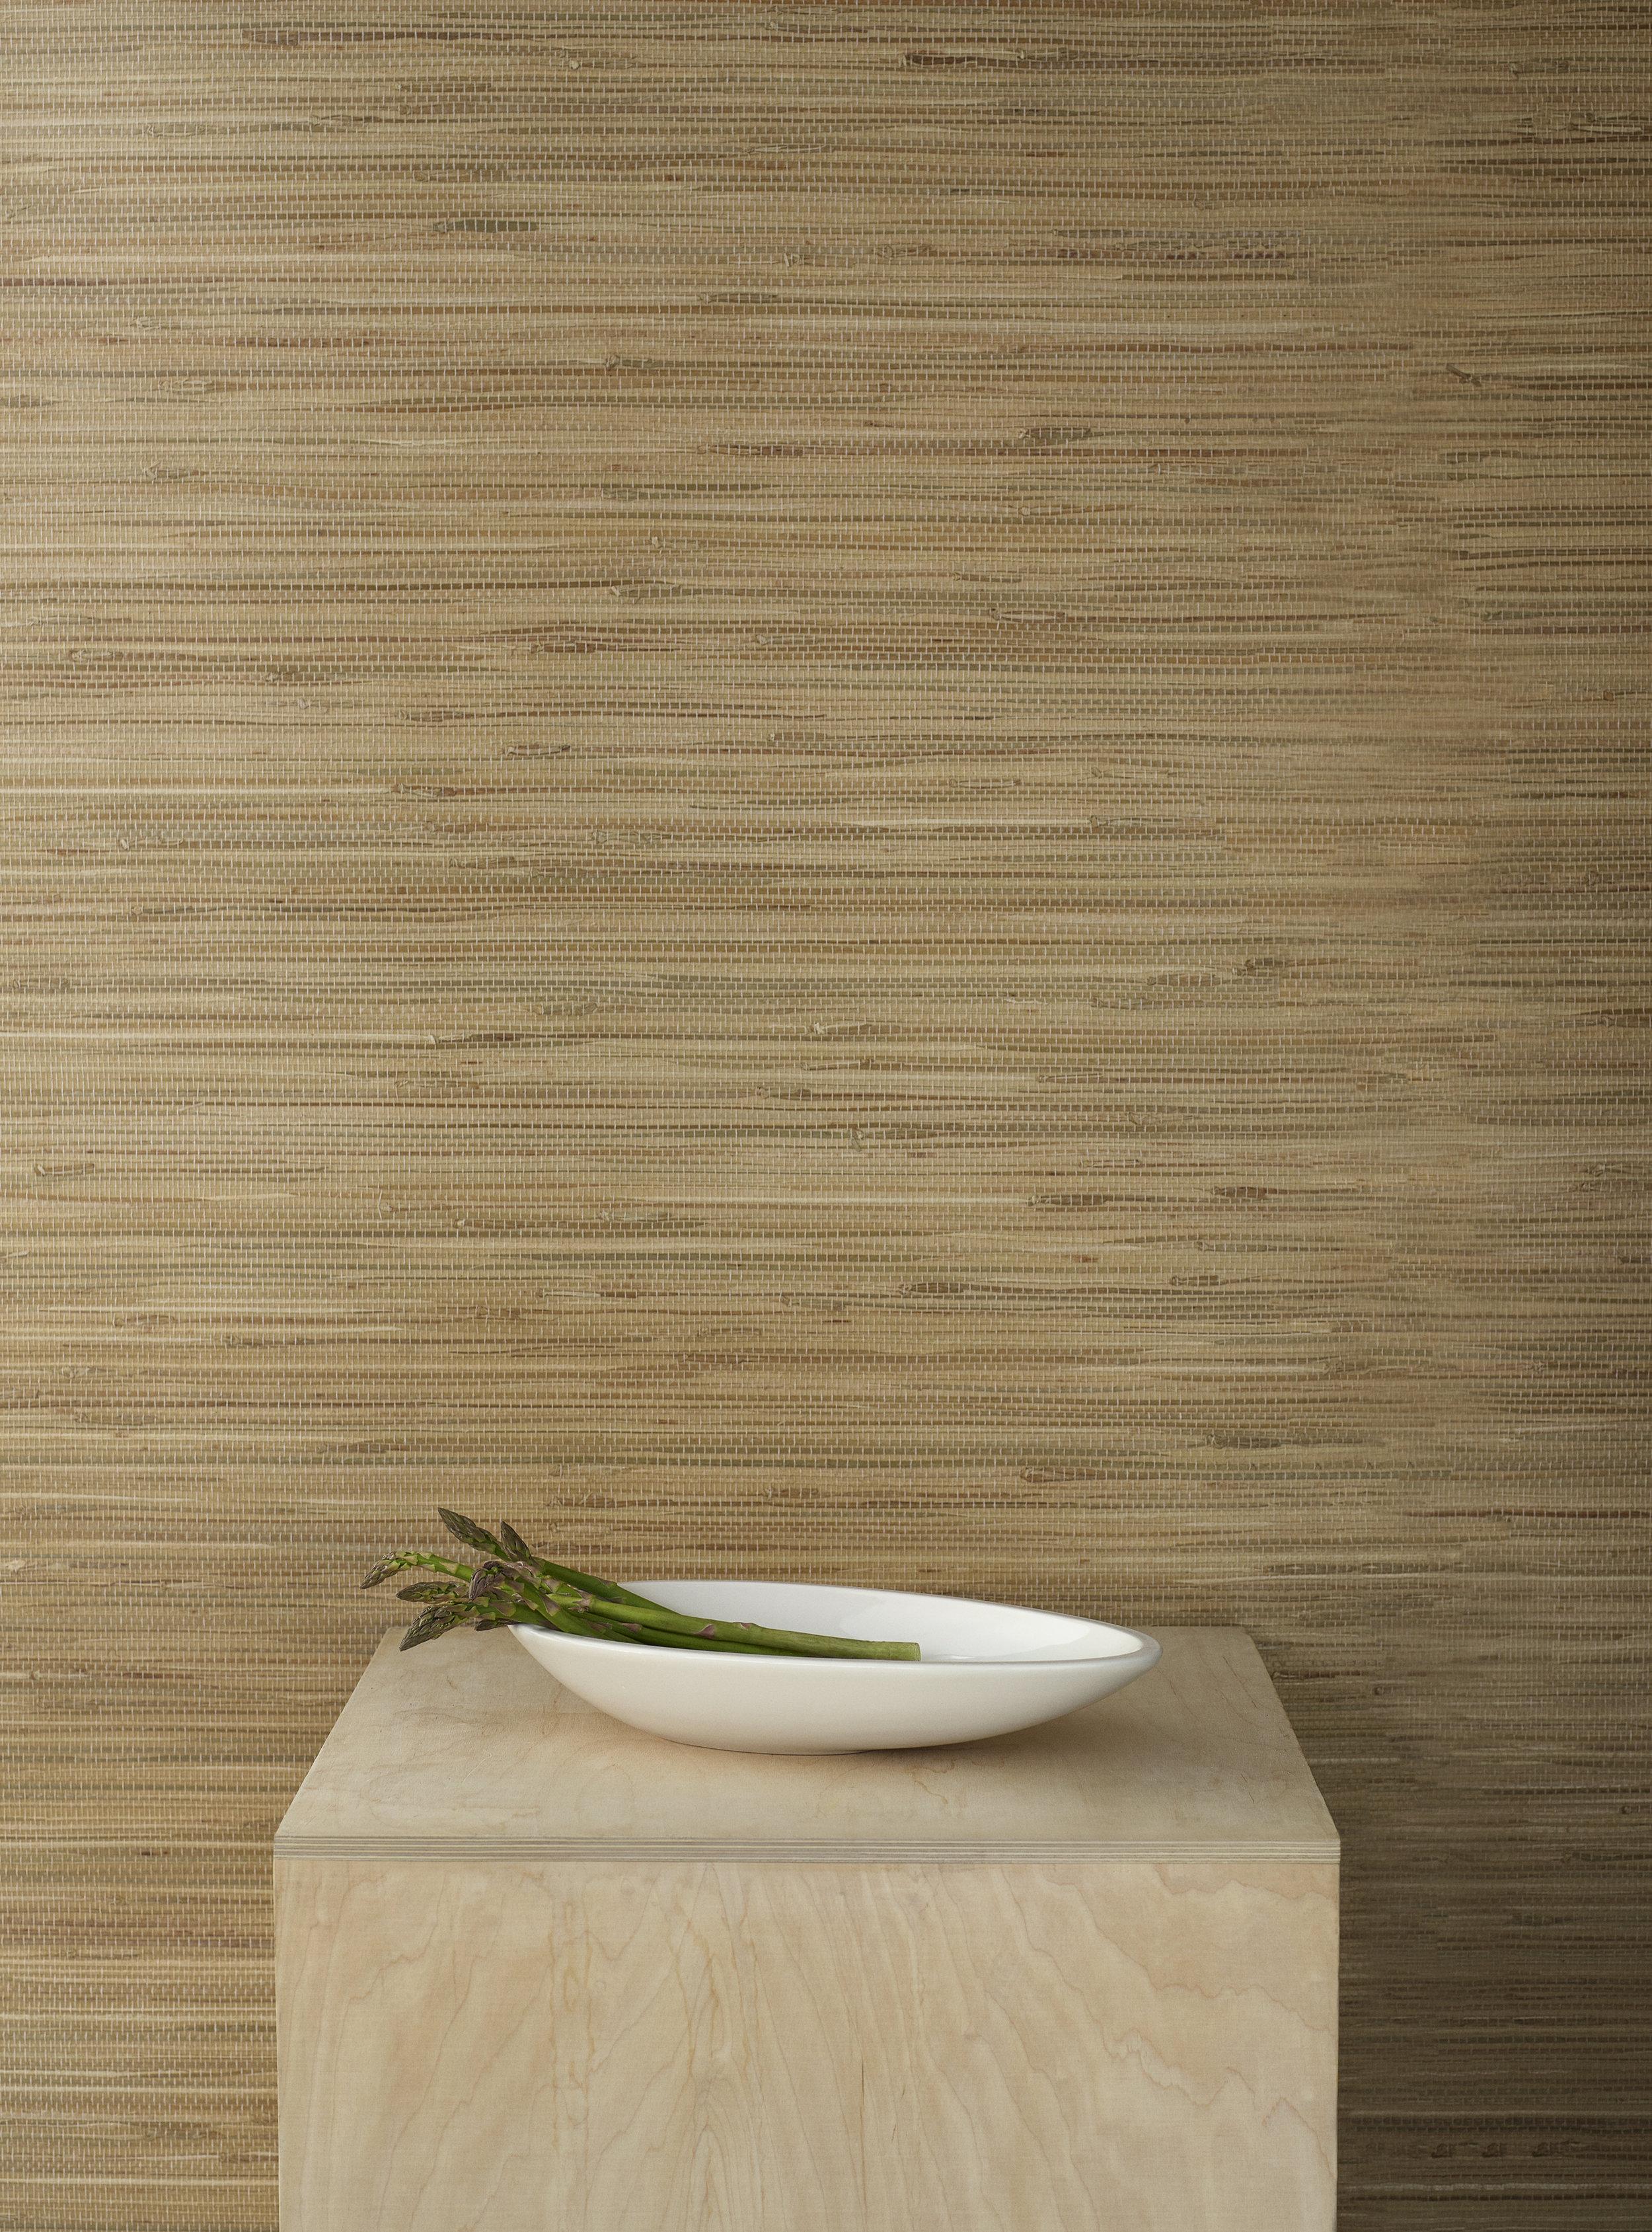 Kokong Platte (35 cm) aus dunkelbraunem bzw. naturweißem Steinzeug, 67.90 EUR